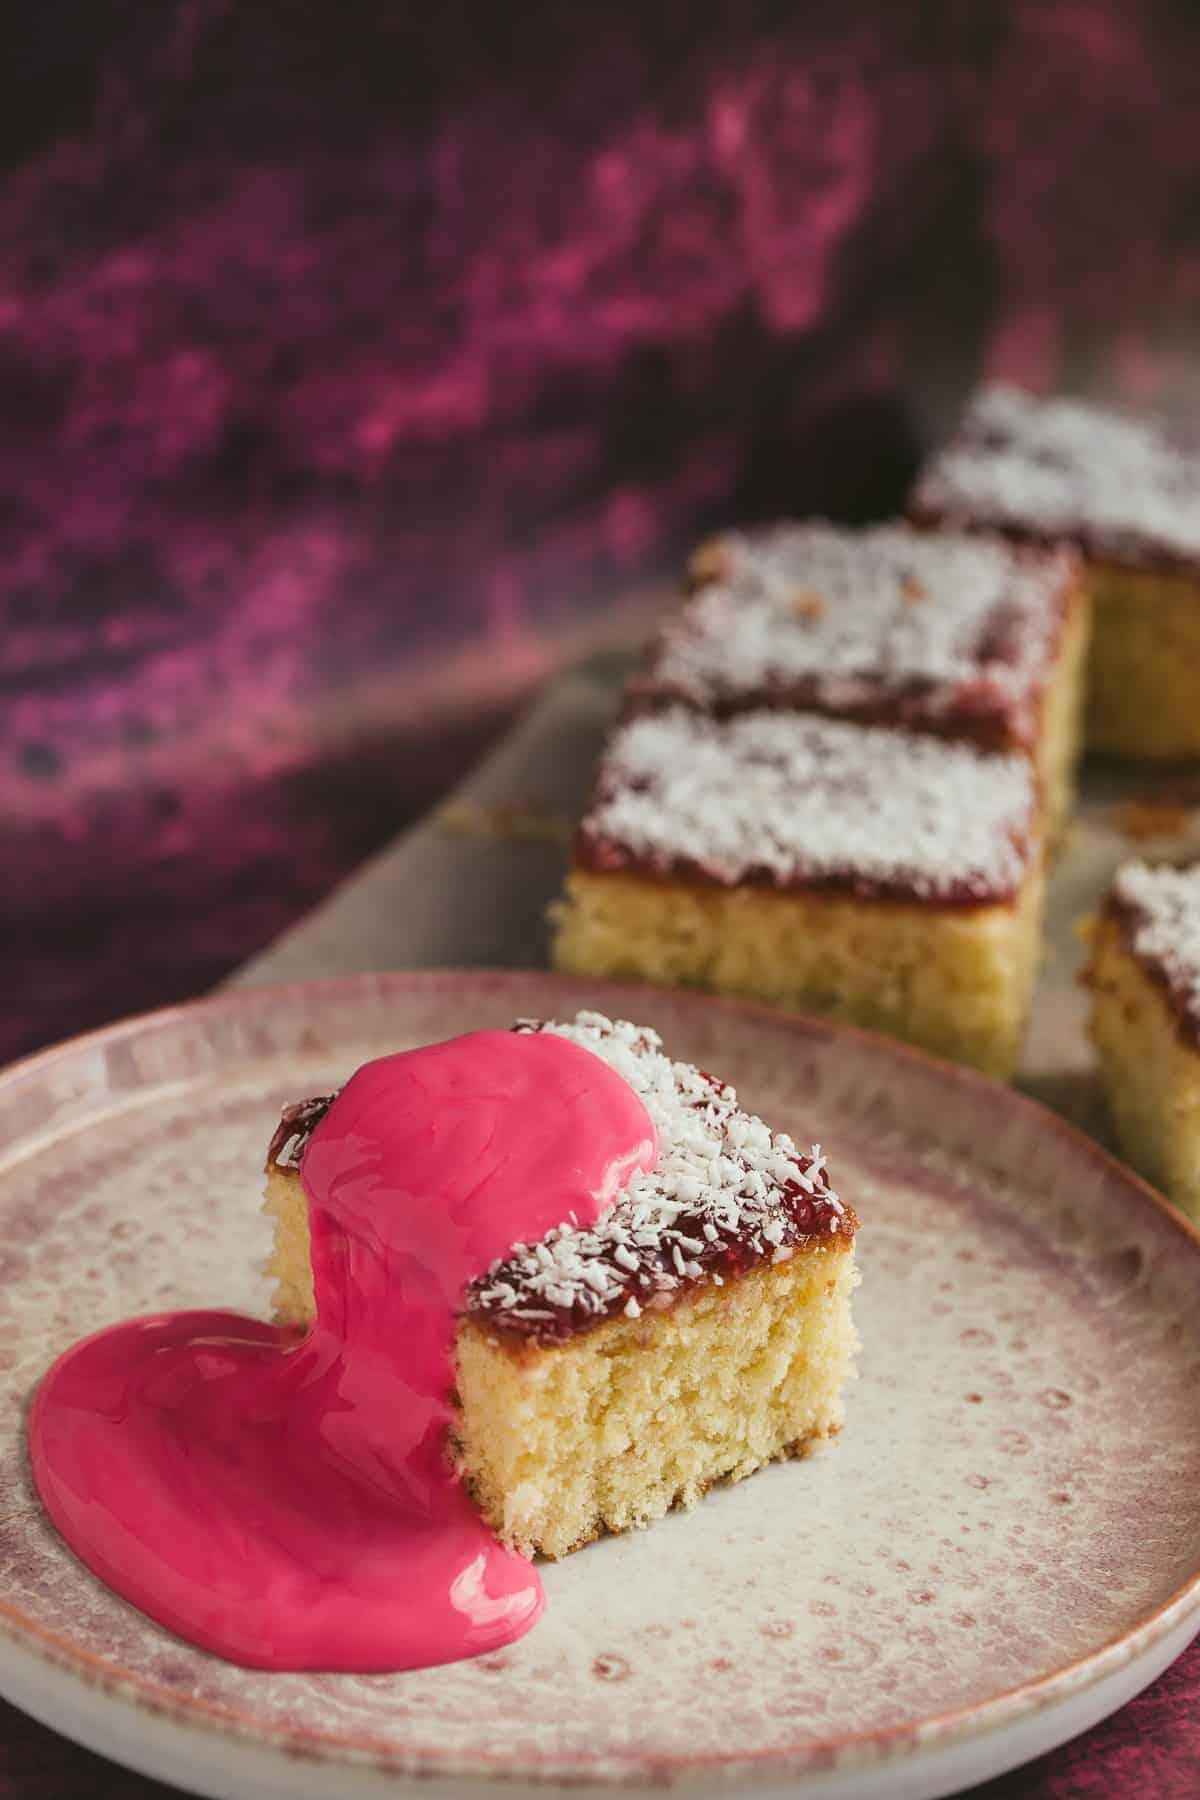 A slice of raspberry jam and coconut cake traybake